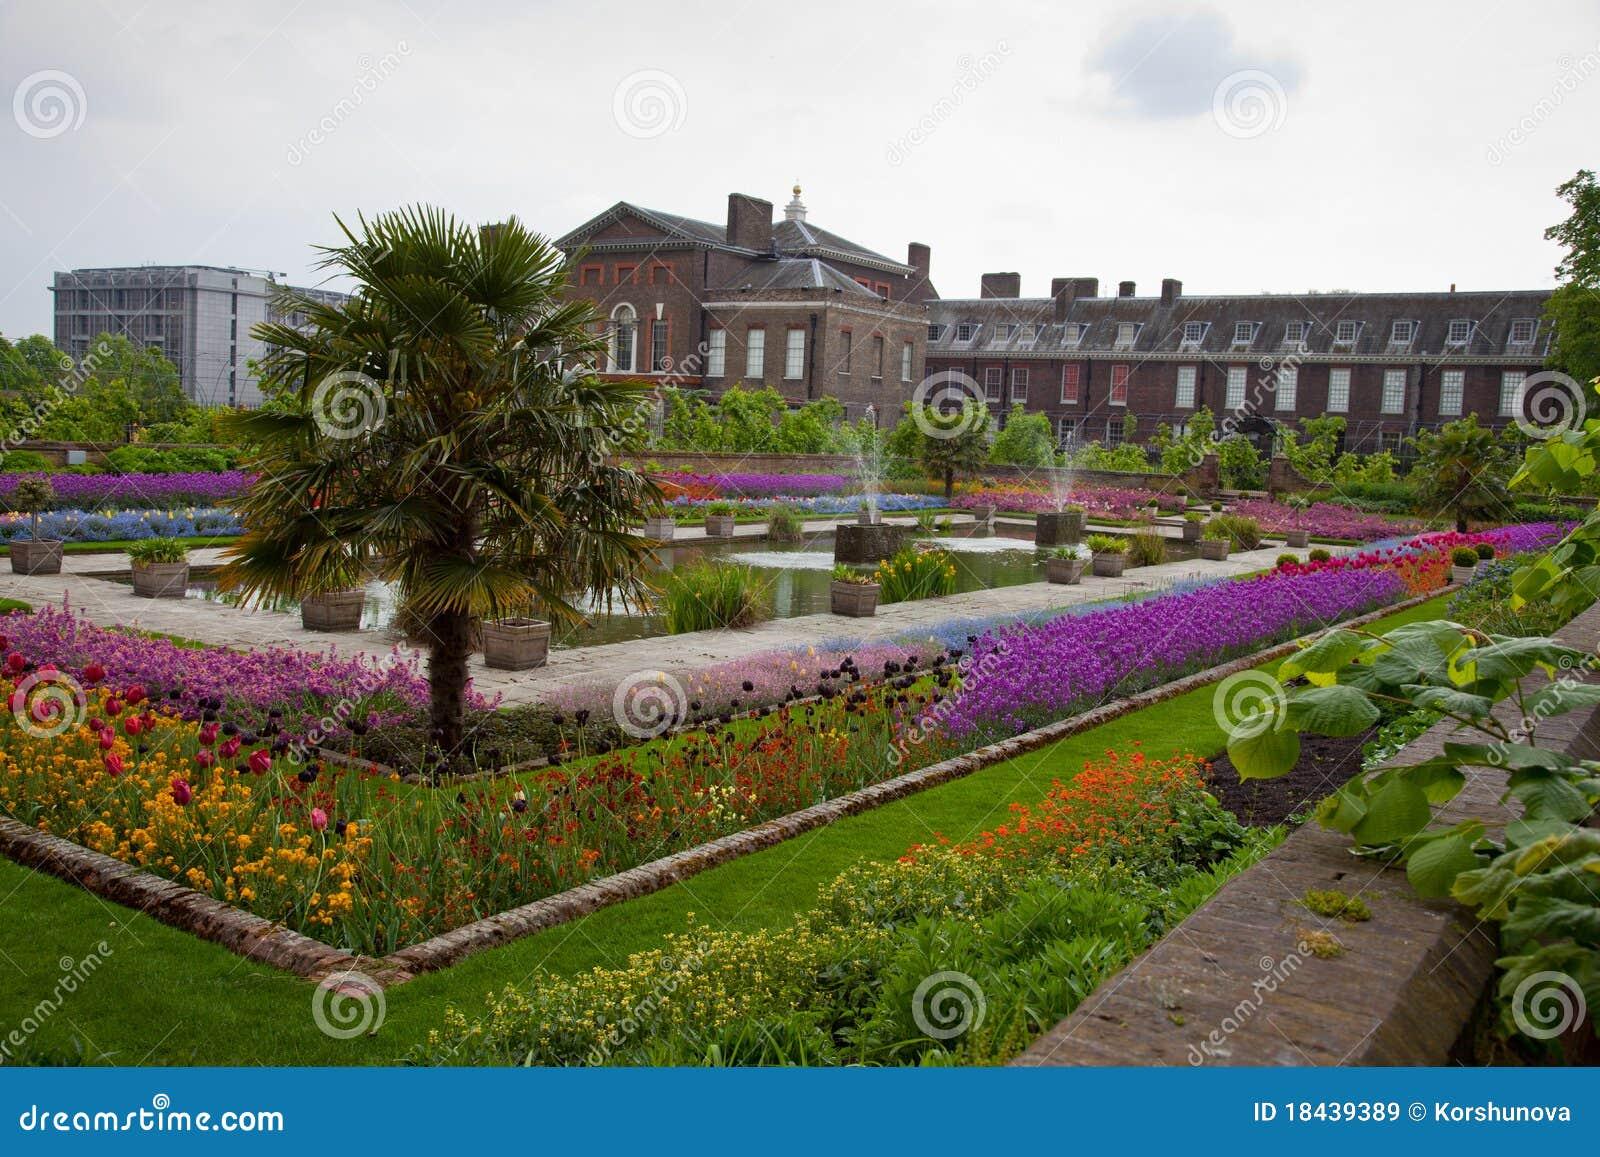 Jardin de palais de kensington londres image stock for Jardines de kensington